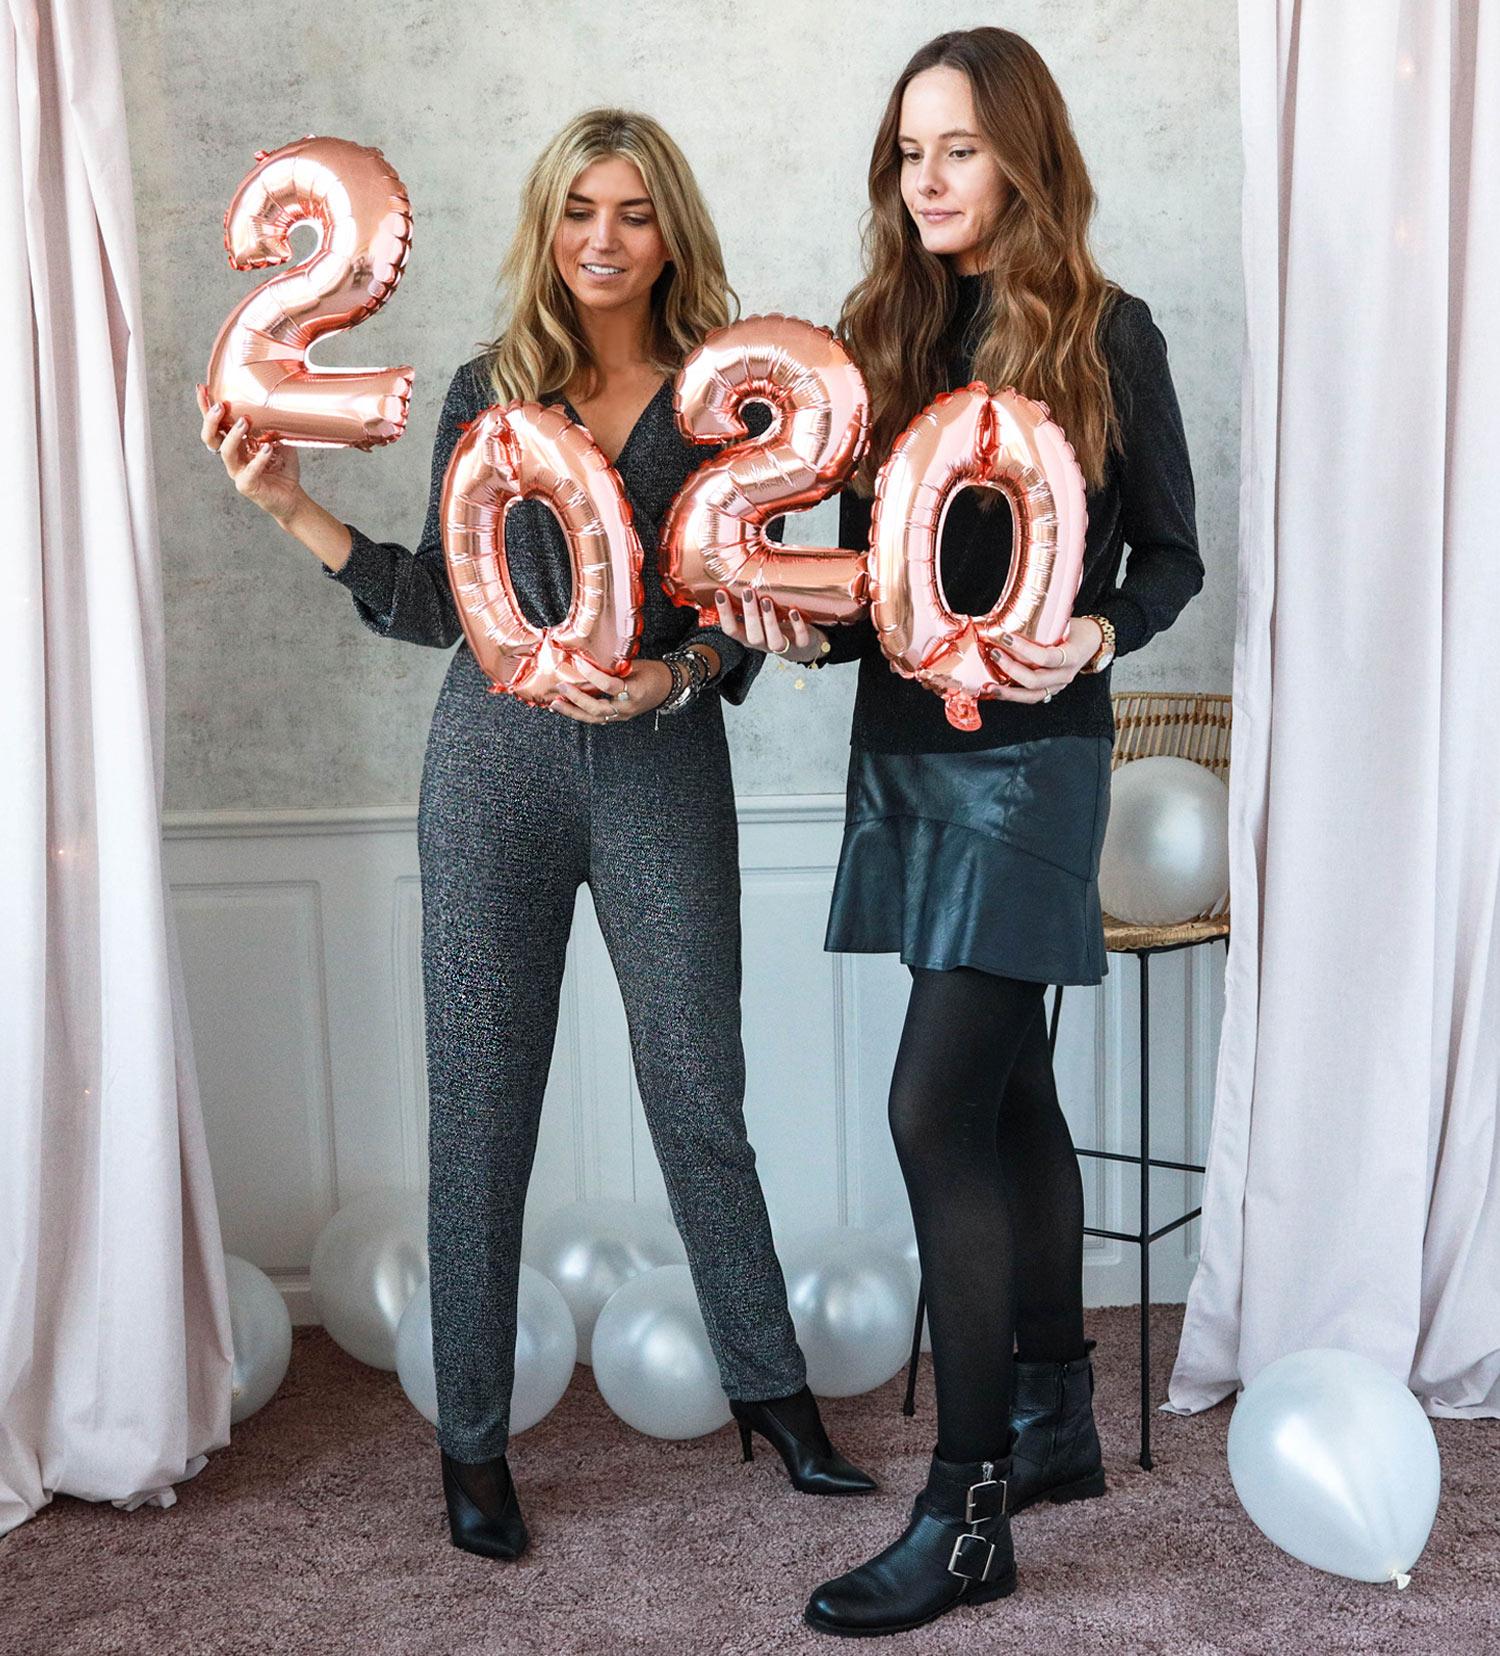 2020-nytaarskjoler-buksedragter-alt-til-nytaar-modetoej.jpg